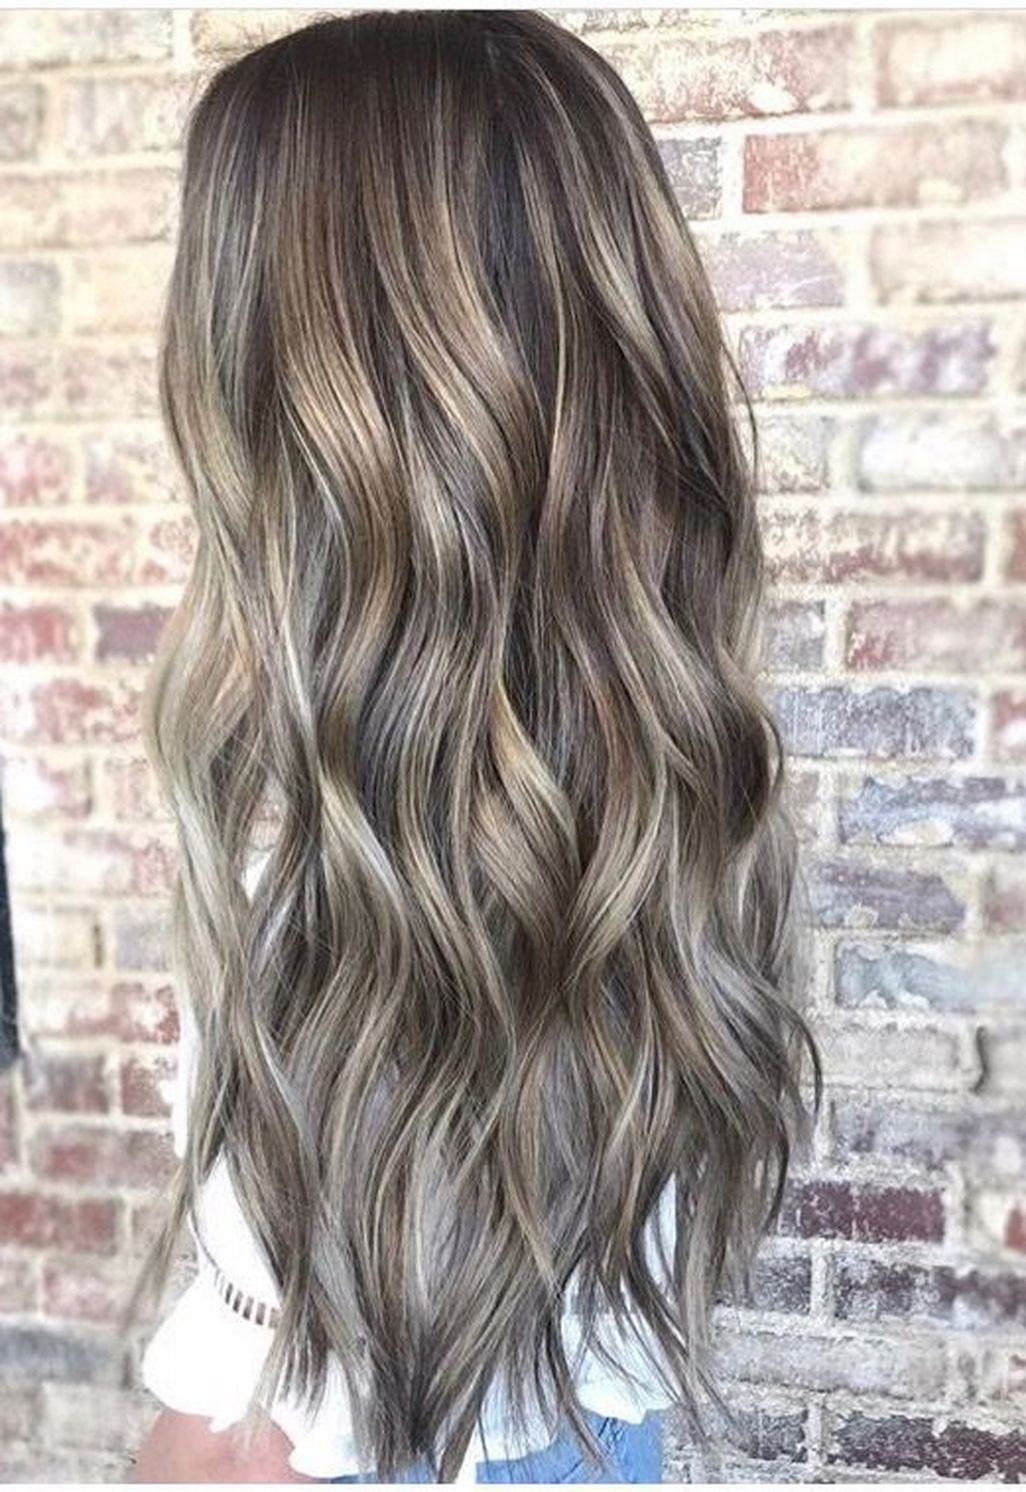 42 Popular Hairstyles For Ash Blonde Hair Hairstyles Pinterest